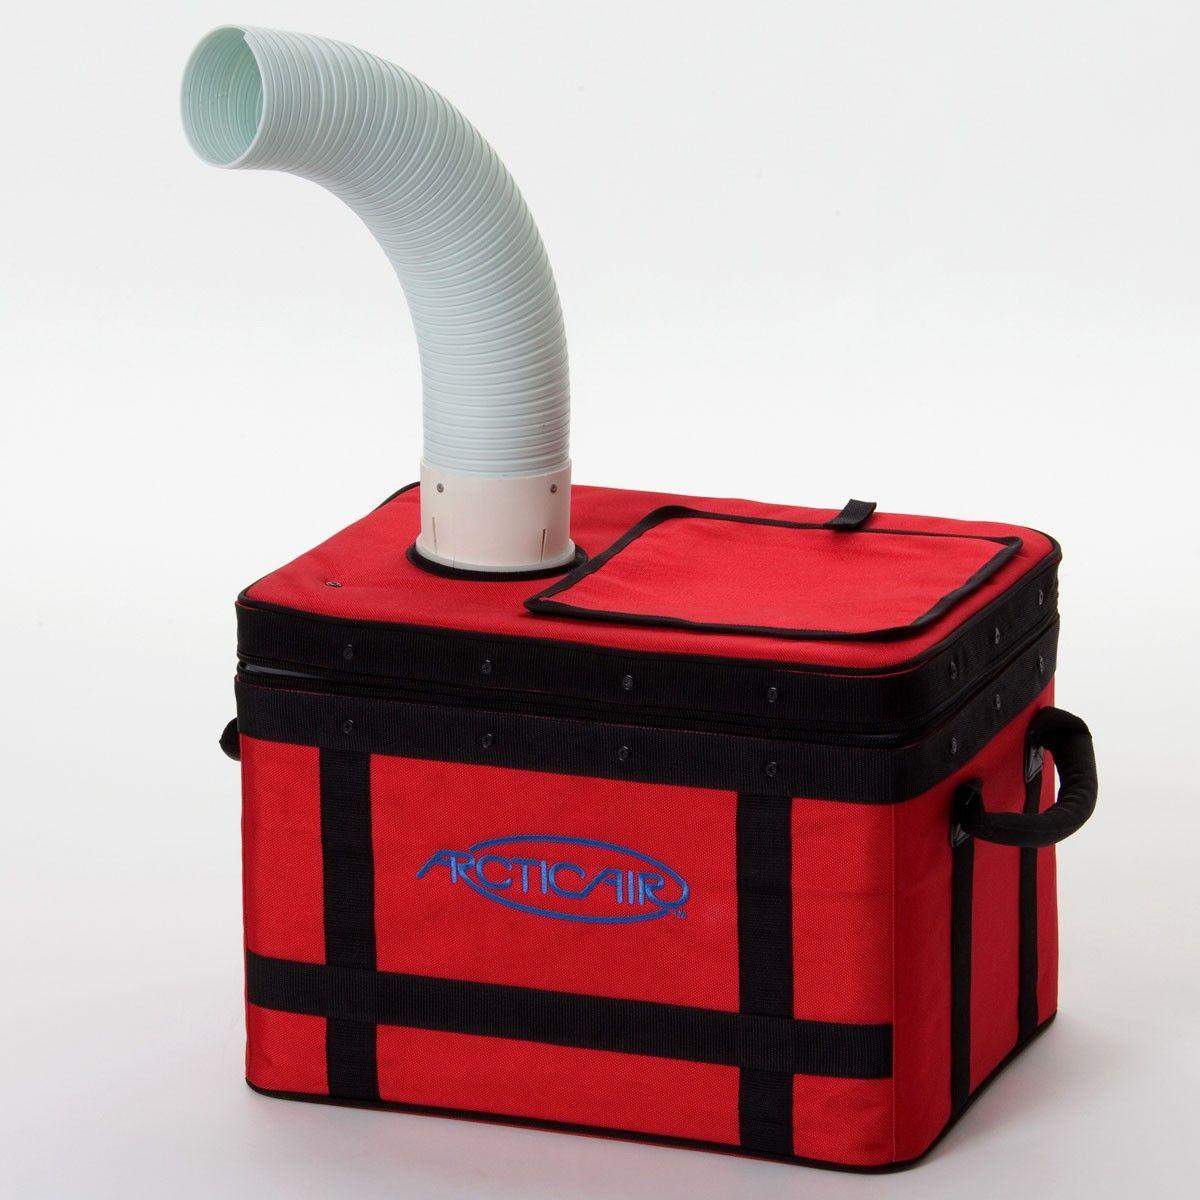 Arctic Air Portable Air Conditioner (38 qt. single fan